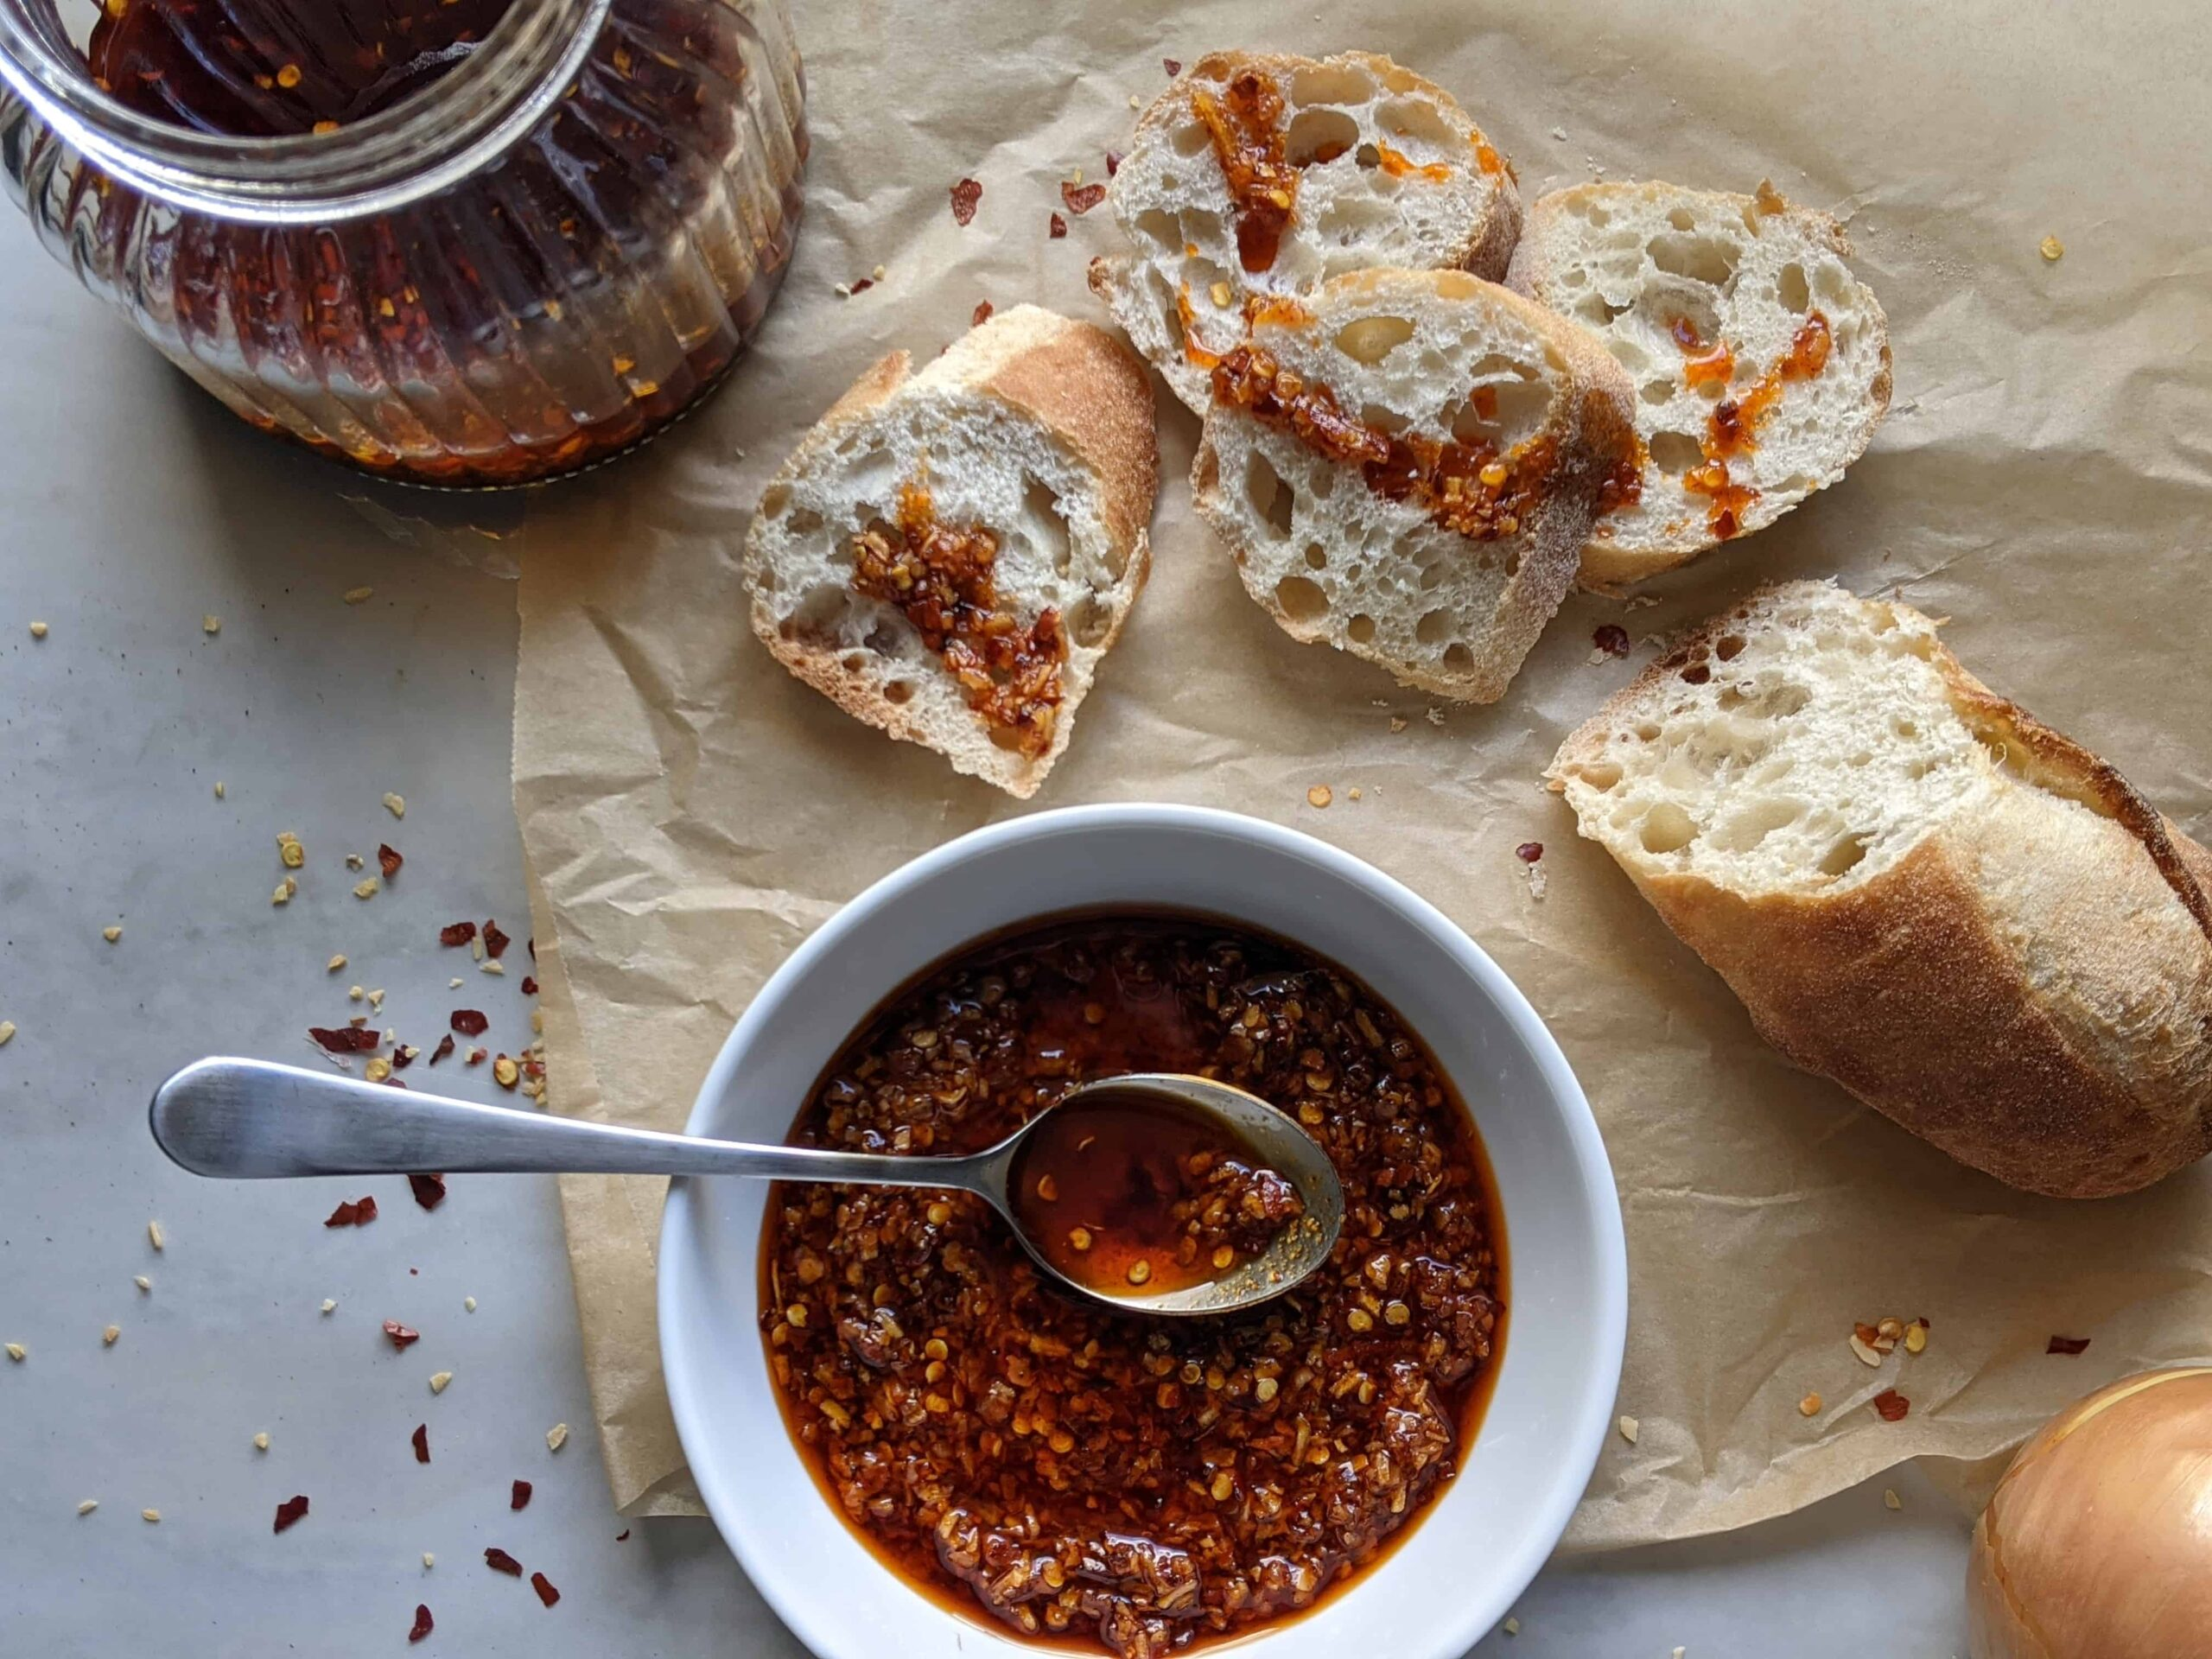 Chili-Garlic Onion Crunch-Trader Joe's Copycat Recipe